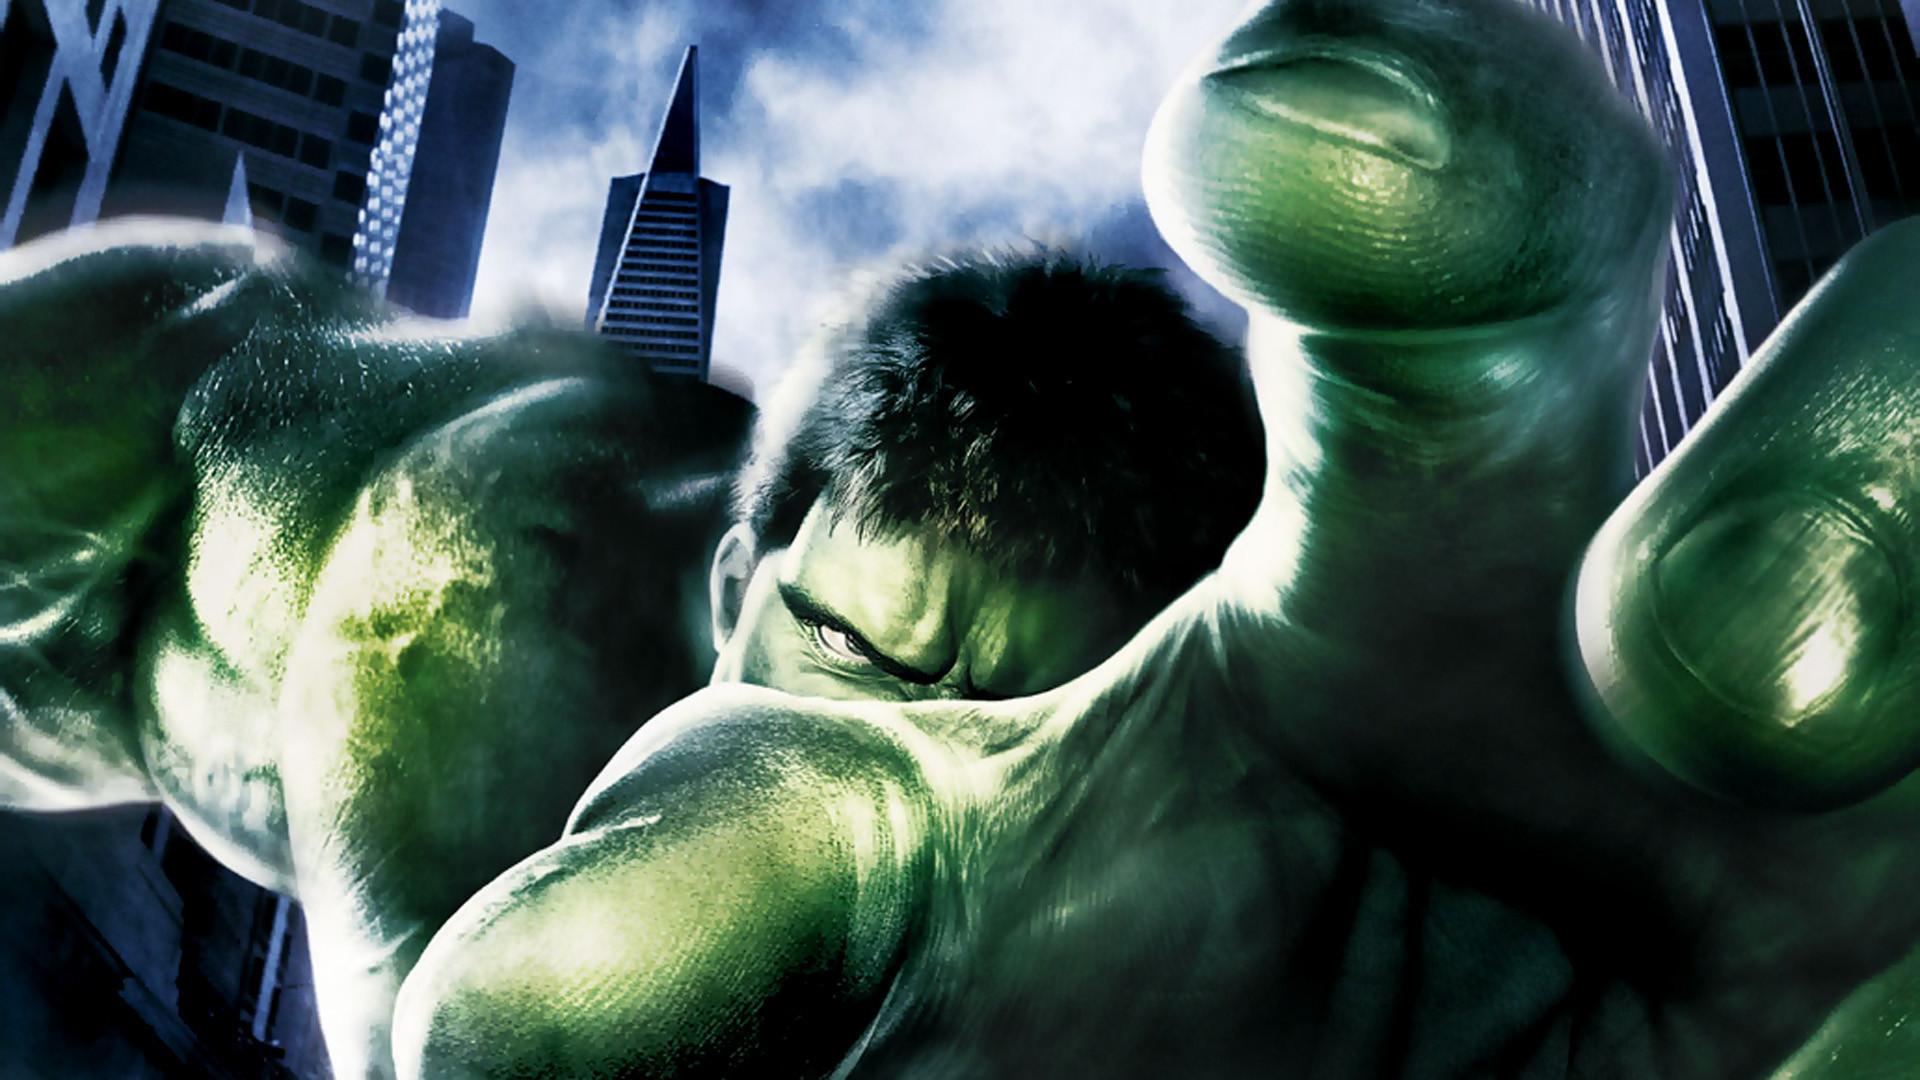 Hulk Movie Wallpapers Hulk Movie Wallpapers | HD Wallpapers